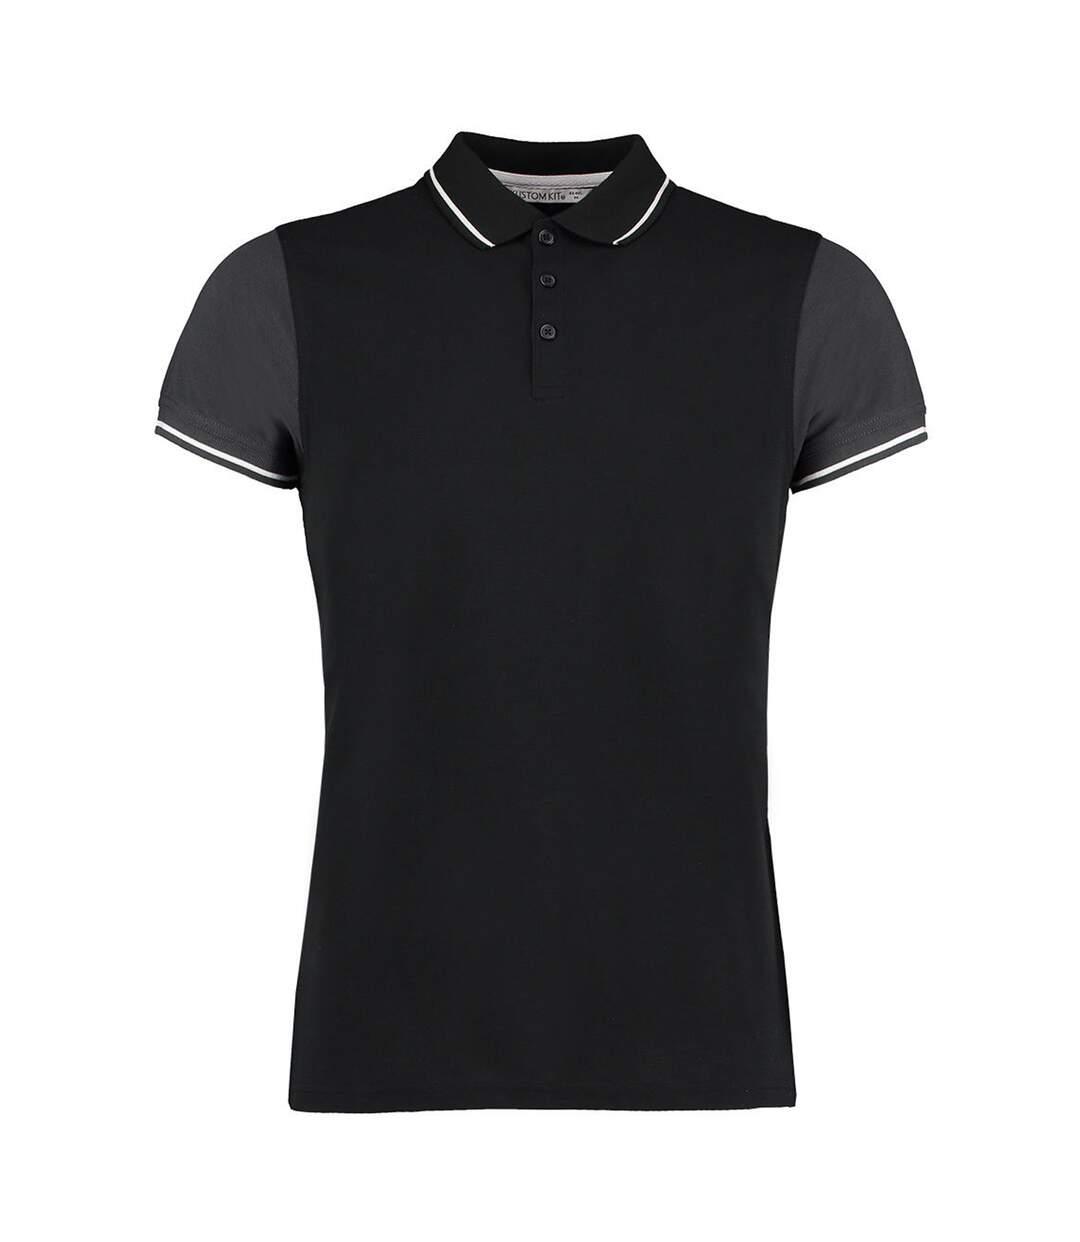 Kustom Kit Mens Two Tone Contrast Tipped Polo Shirt (Black/Graphite/White) - UTBC3728